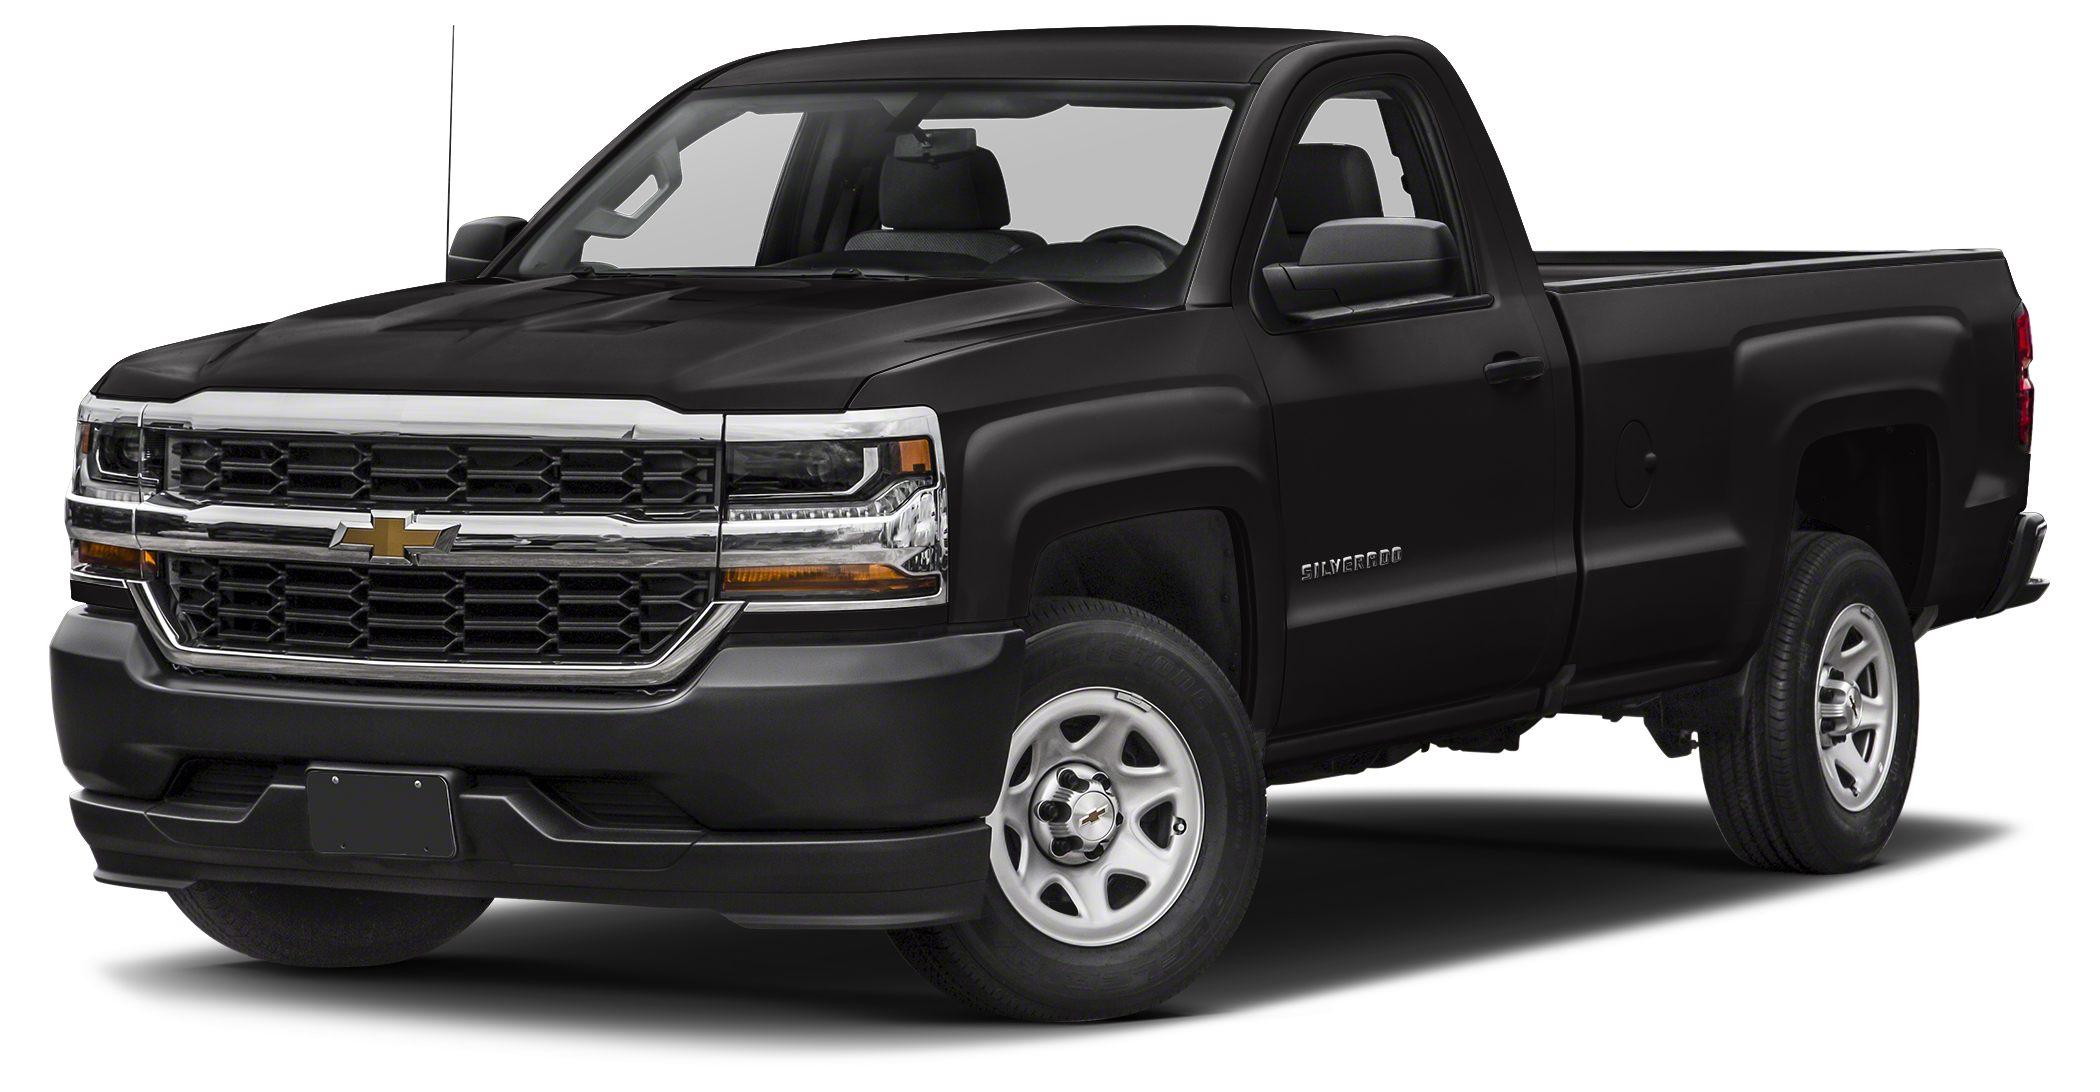 2016 Chevrolet Silverado 1500  Miles 5Color Black Stock 166062 VIN 1GCNCNEH6GZ200945